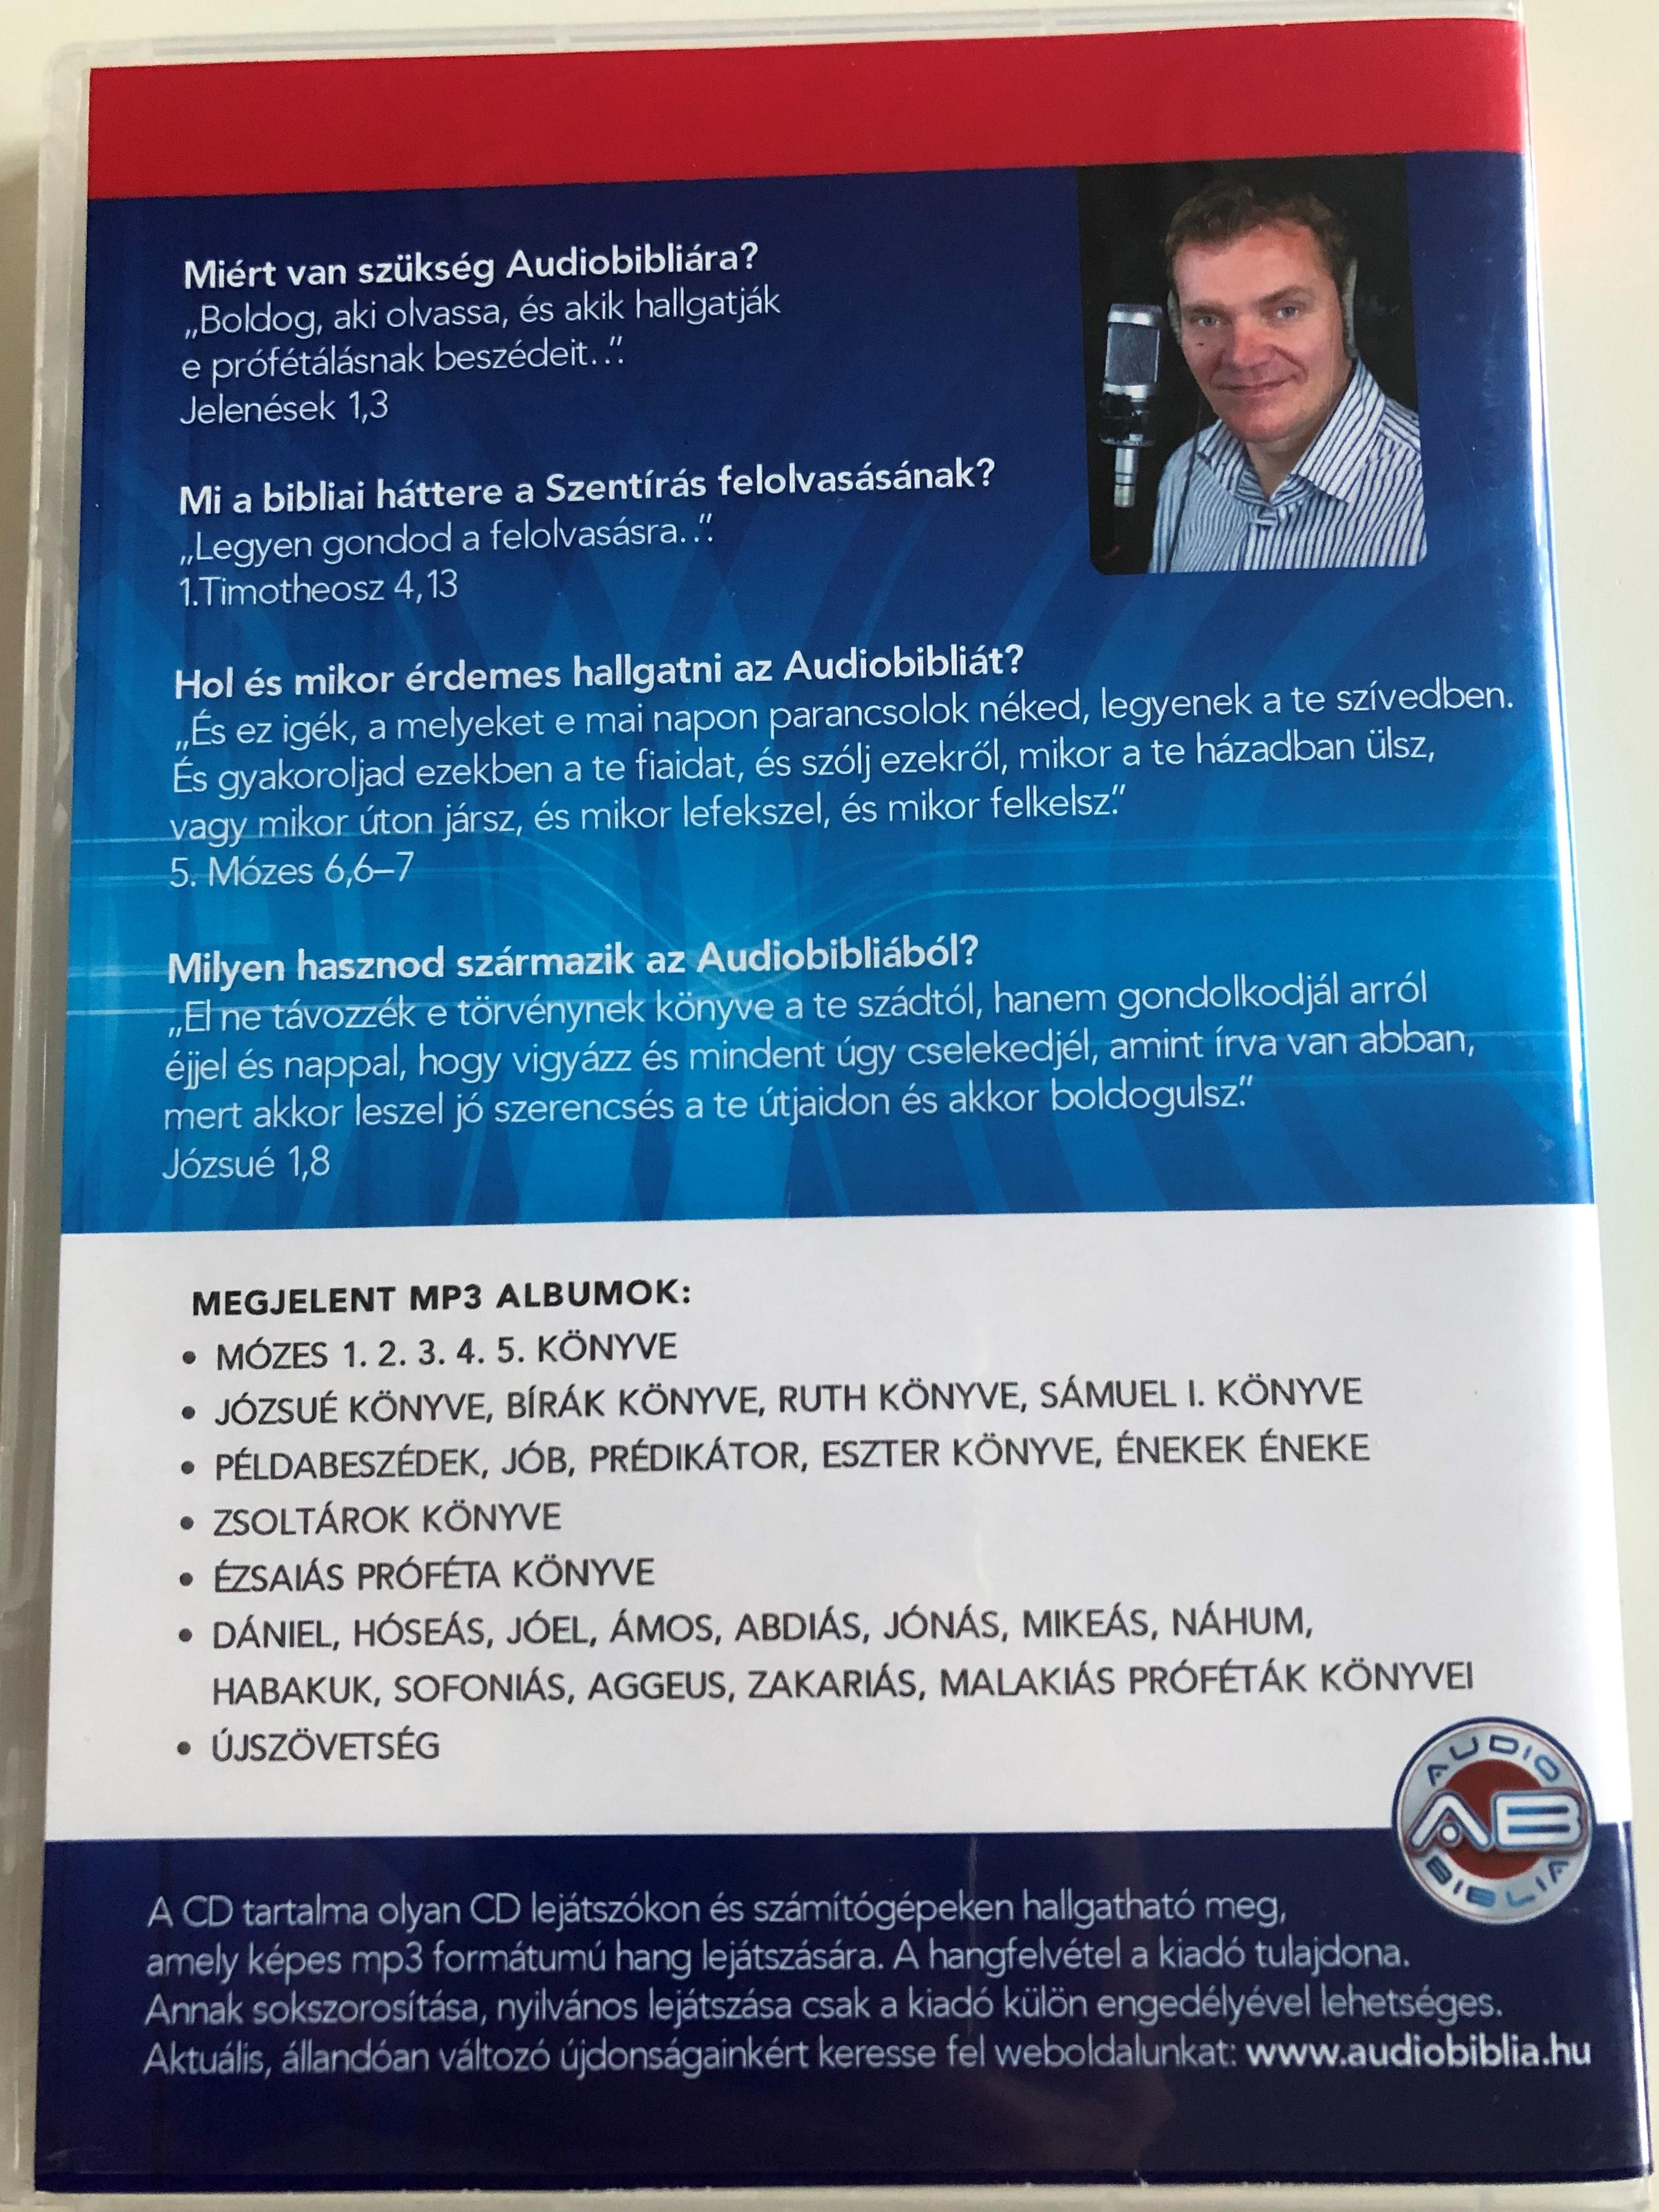 hungarian-audio-bible-the-book-of-psalms-audio-biblia-3.jpg